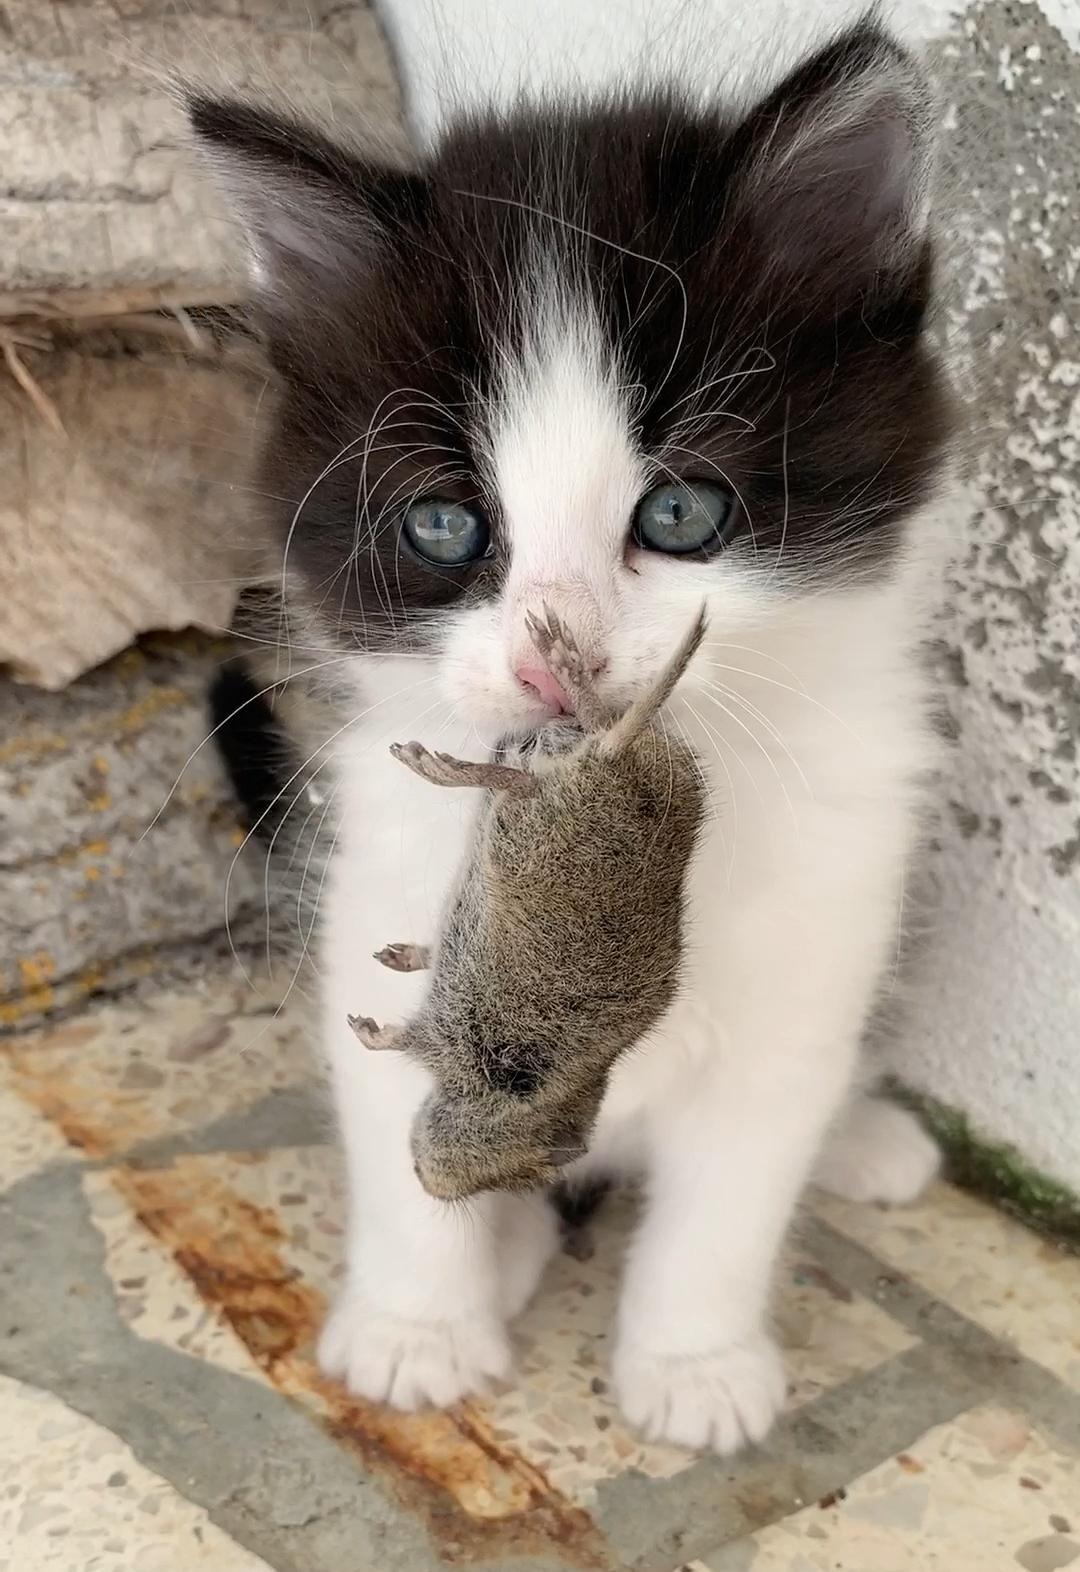 Chaton Video In 2020 Cute Kitten Gif Kittens Cutest Cute Animals